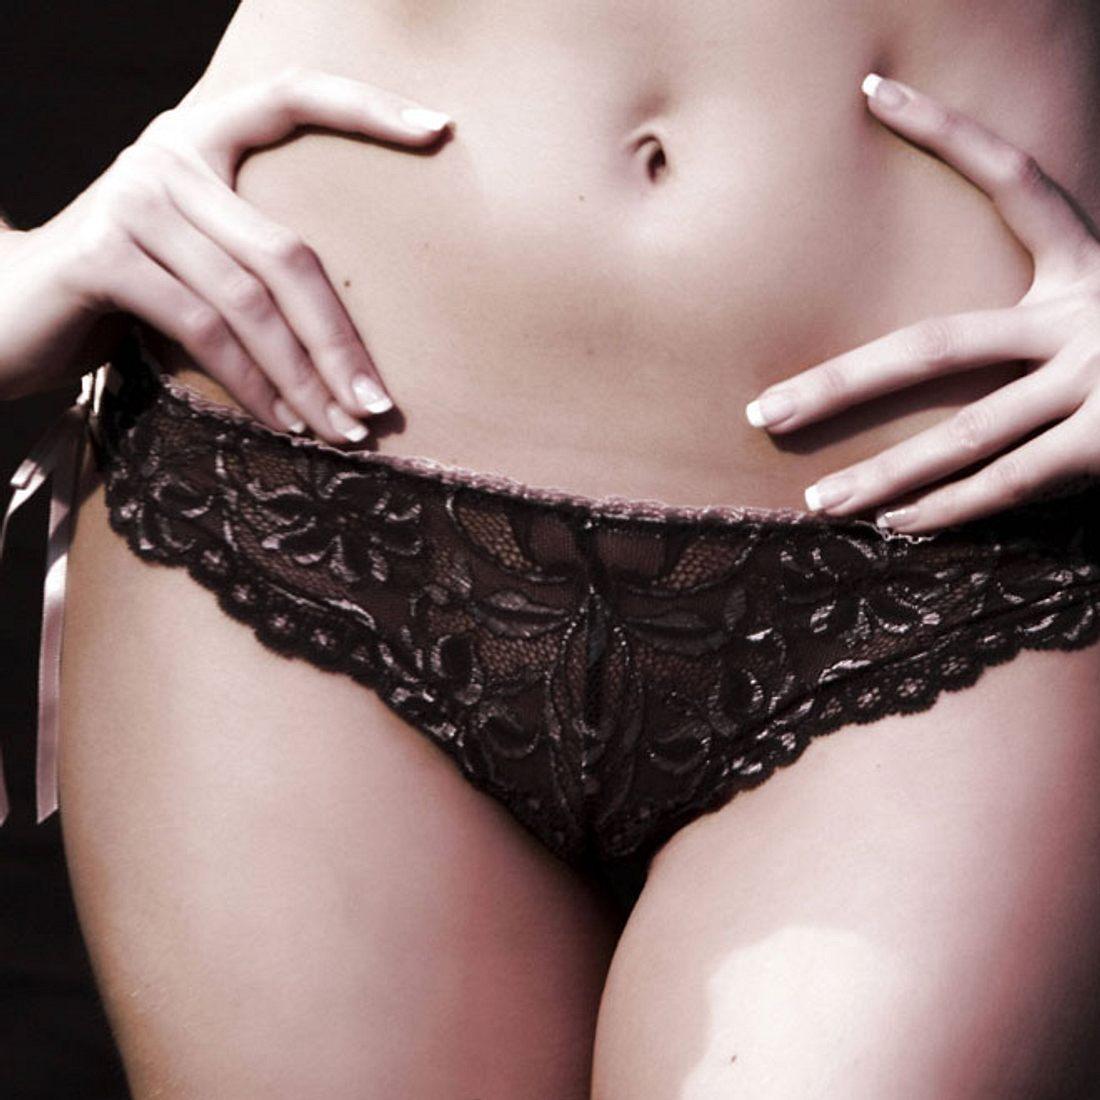 Fragwürdiges Beauty-Ritual: Apfelessig soll die VAGINA straffen